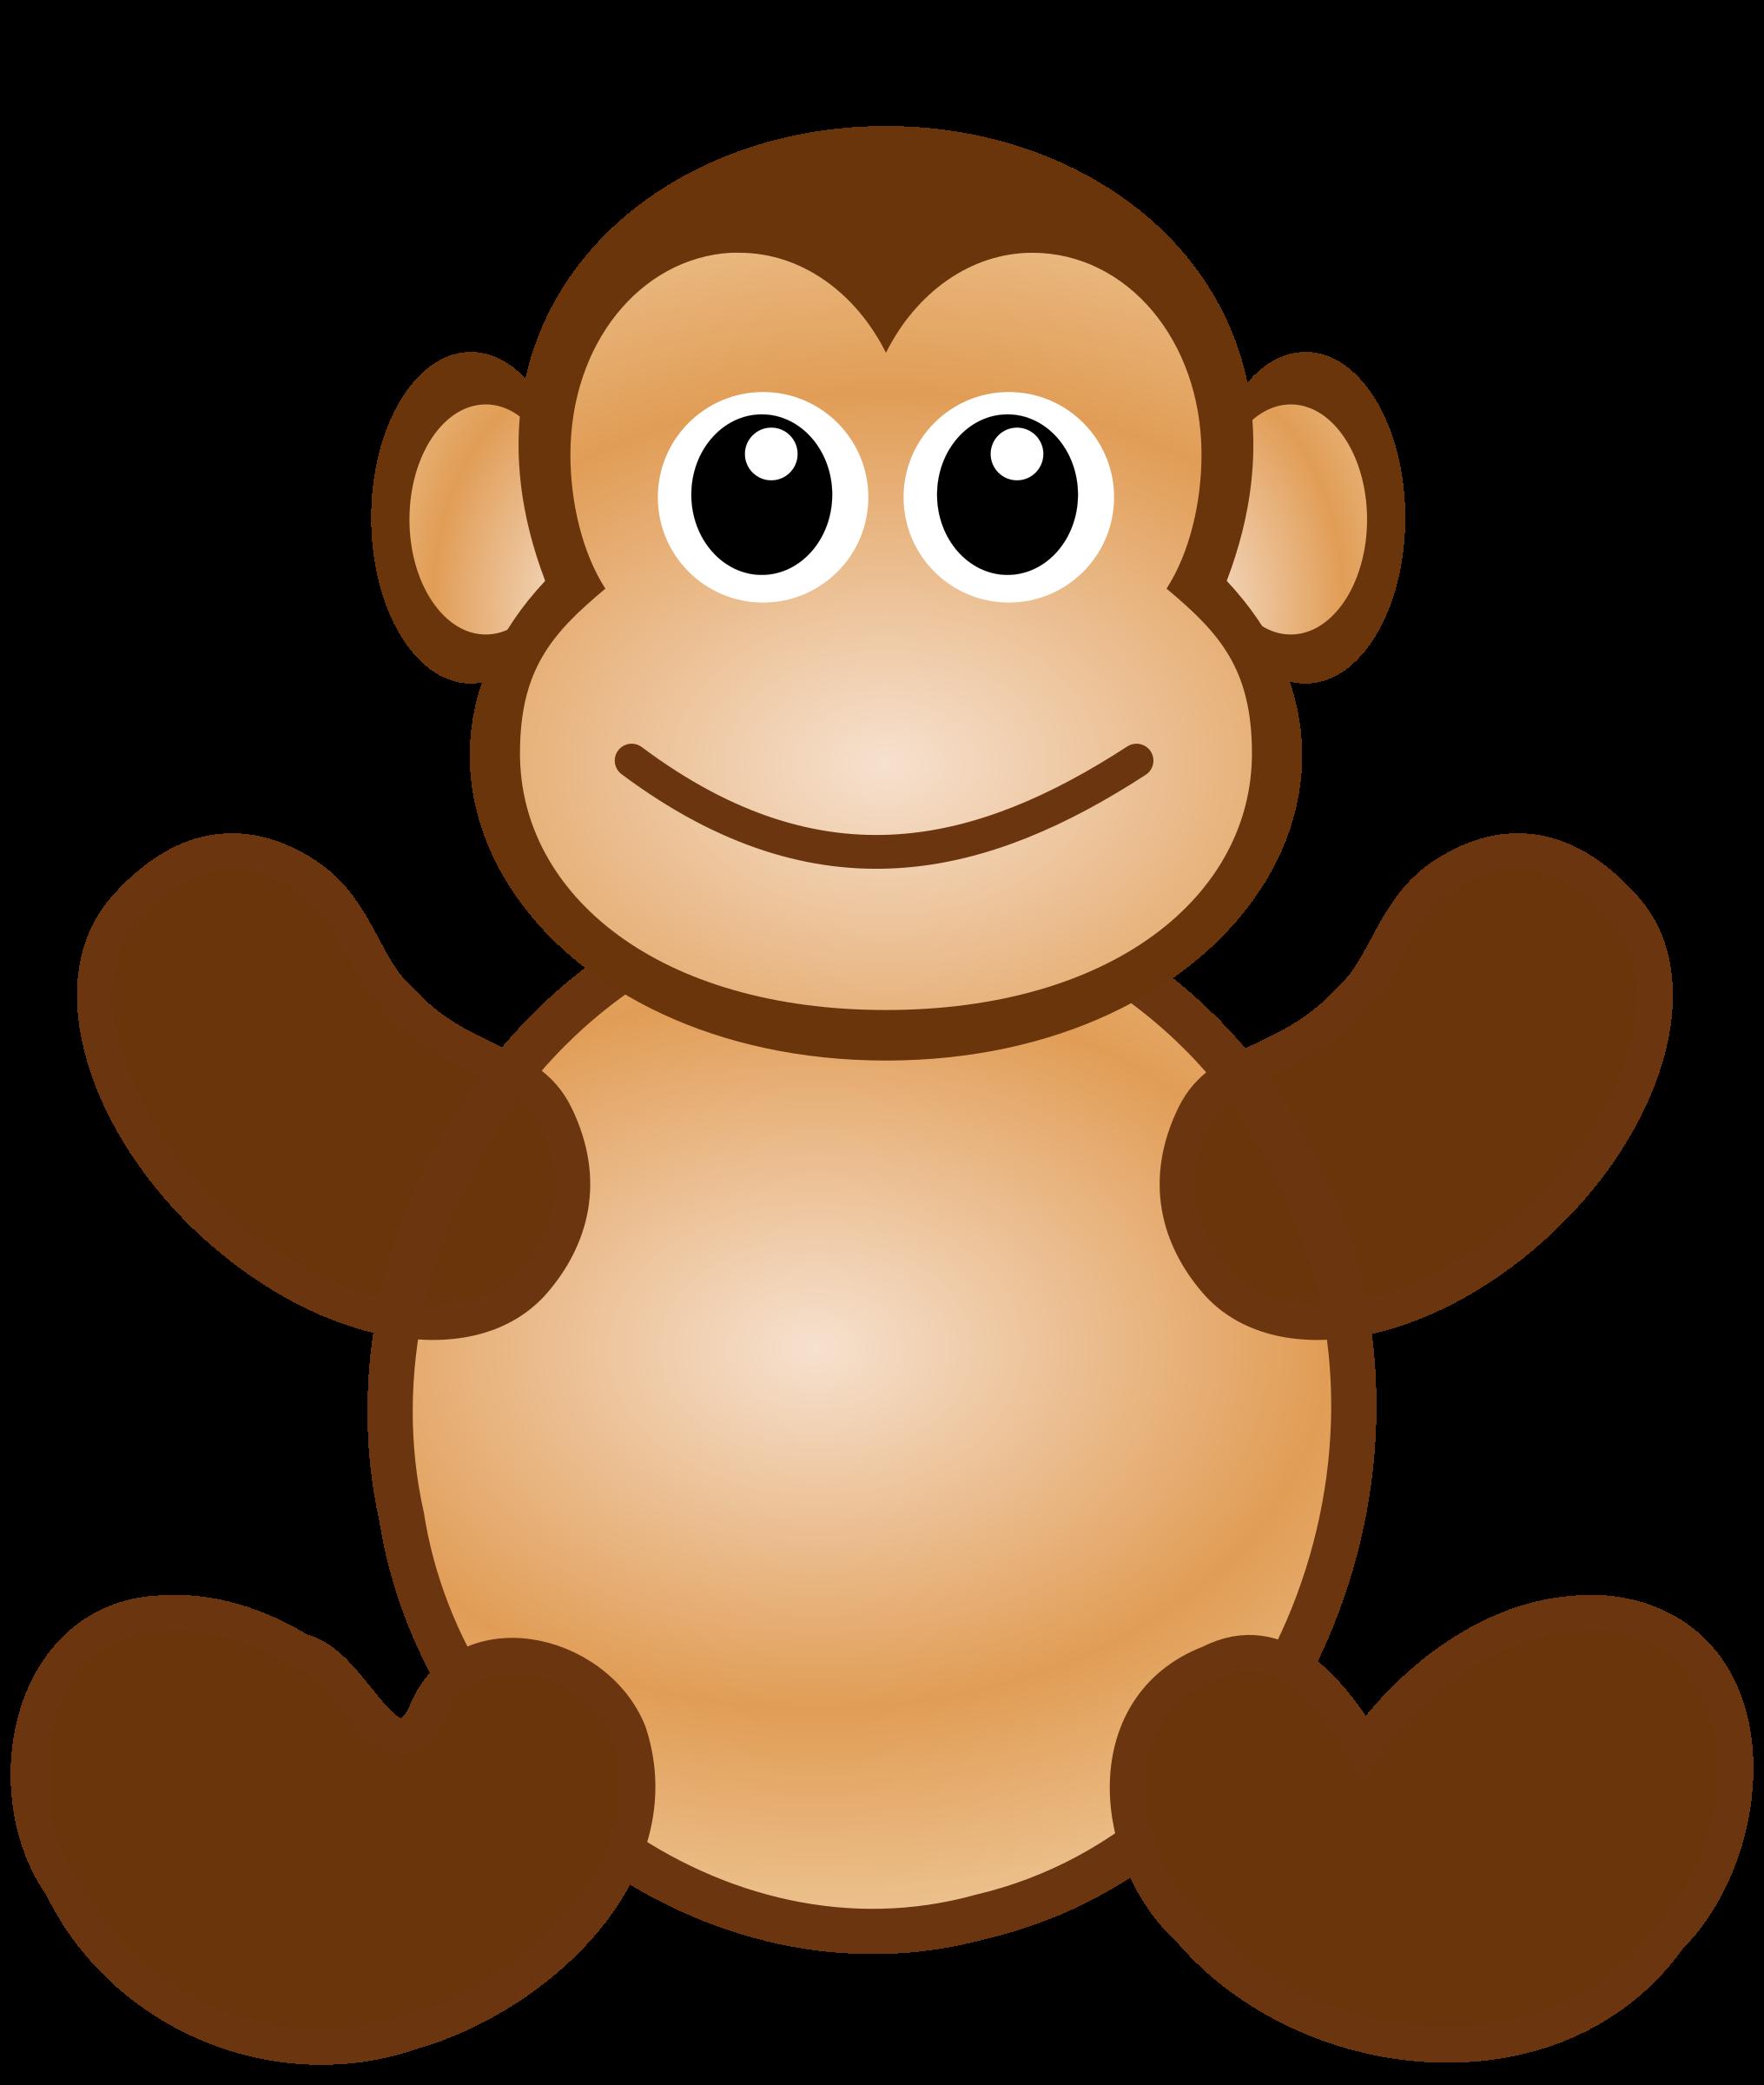 svg freeuse library Monkey toy big image. Ape clipart chimpanzee